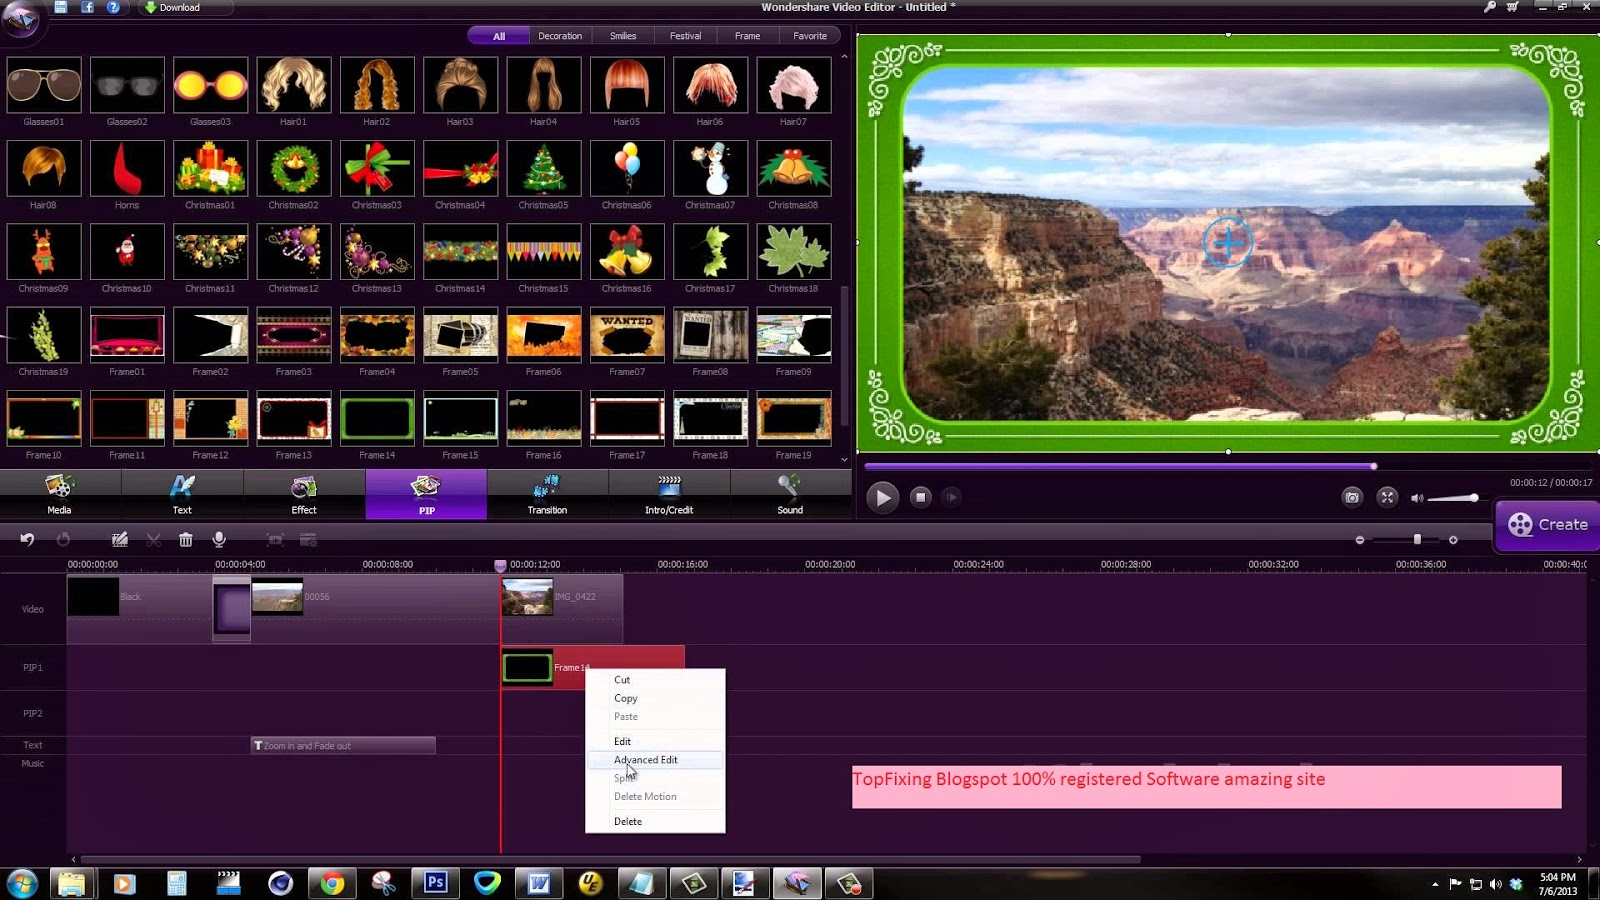 filmora software download for windows 7 32 bit